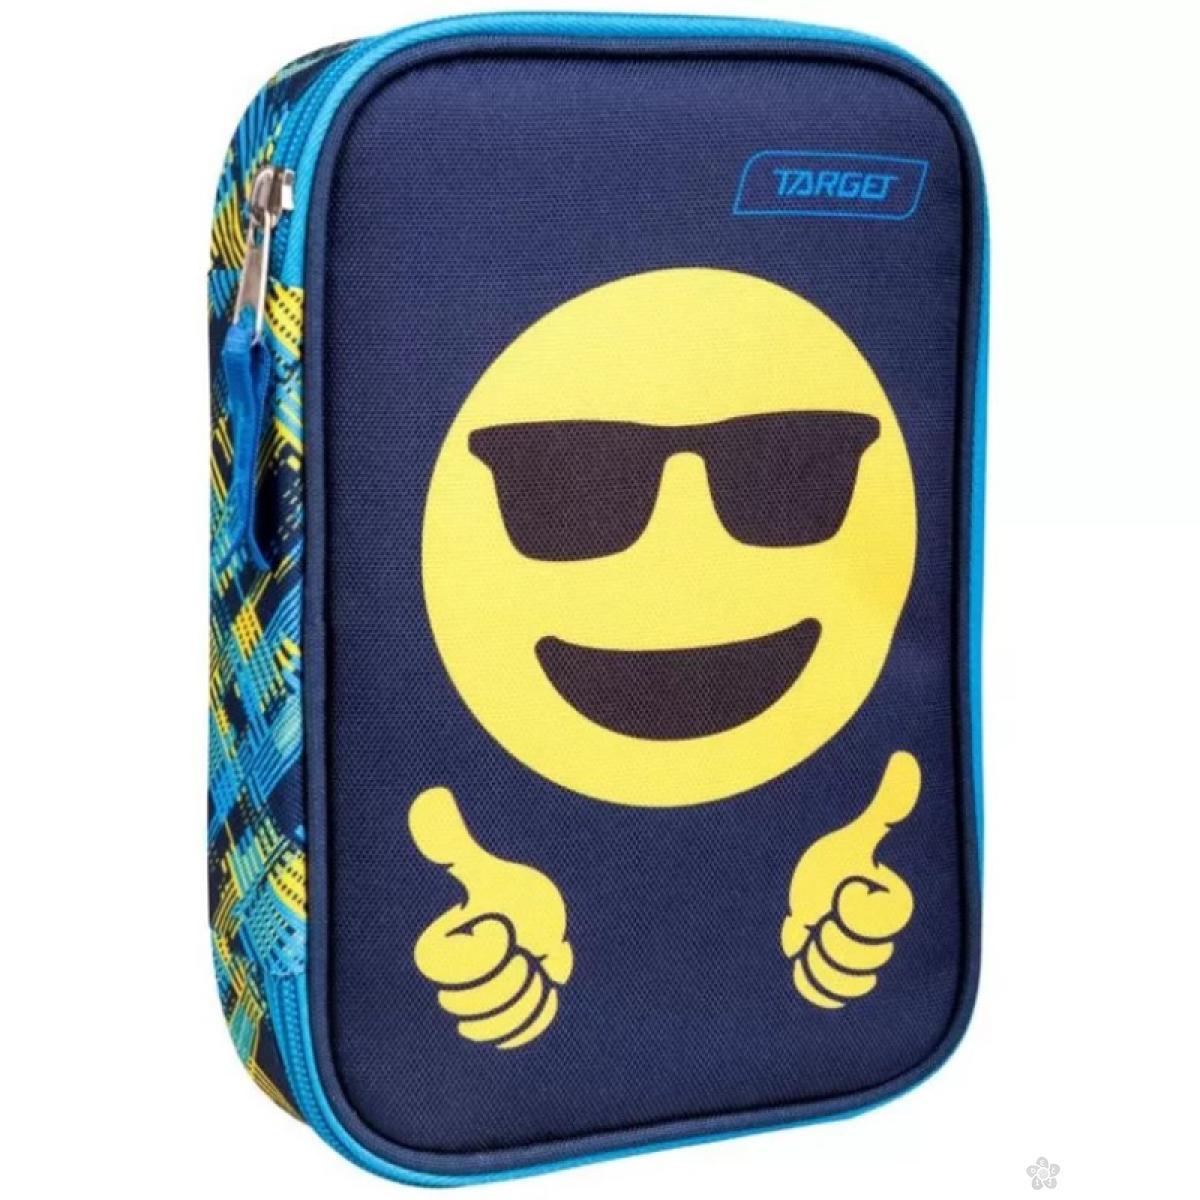 Pernica puna Target Emoji 26726